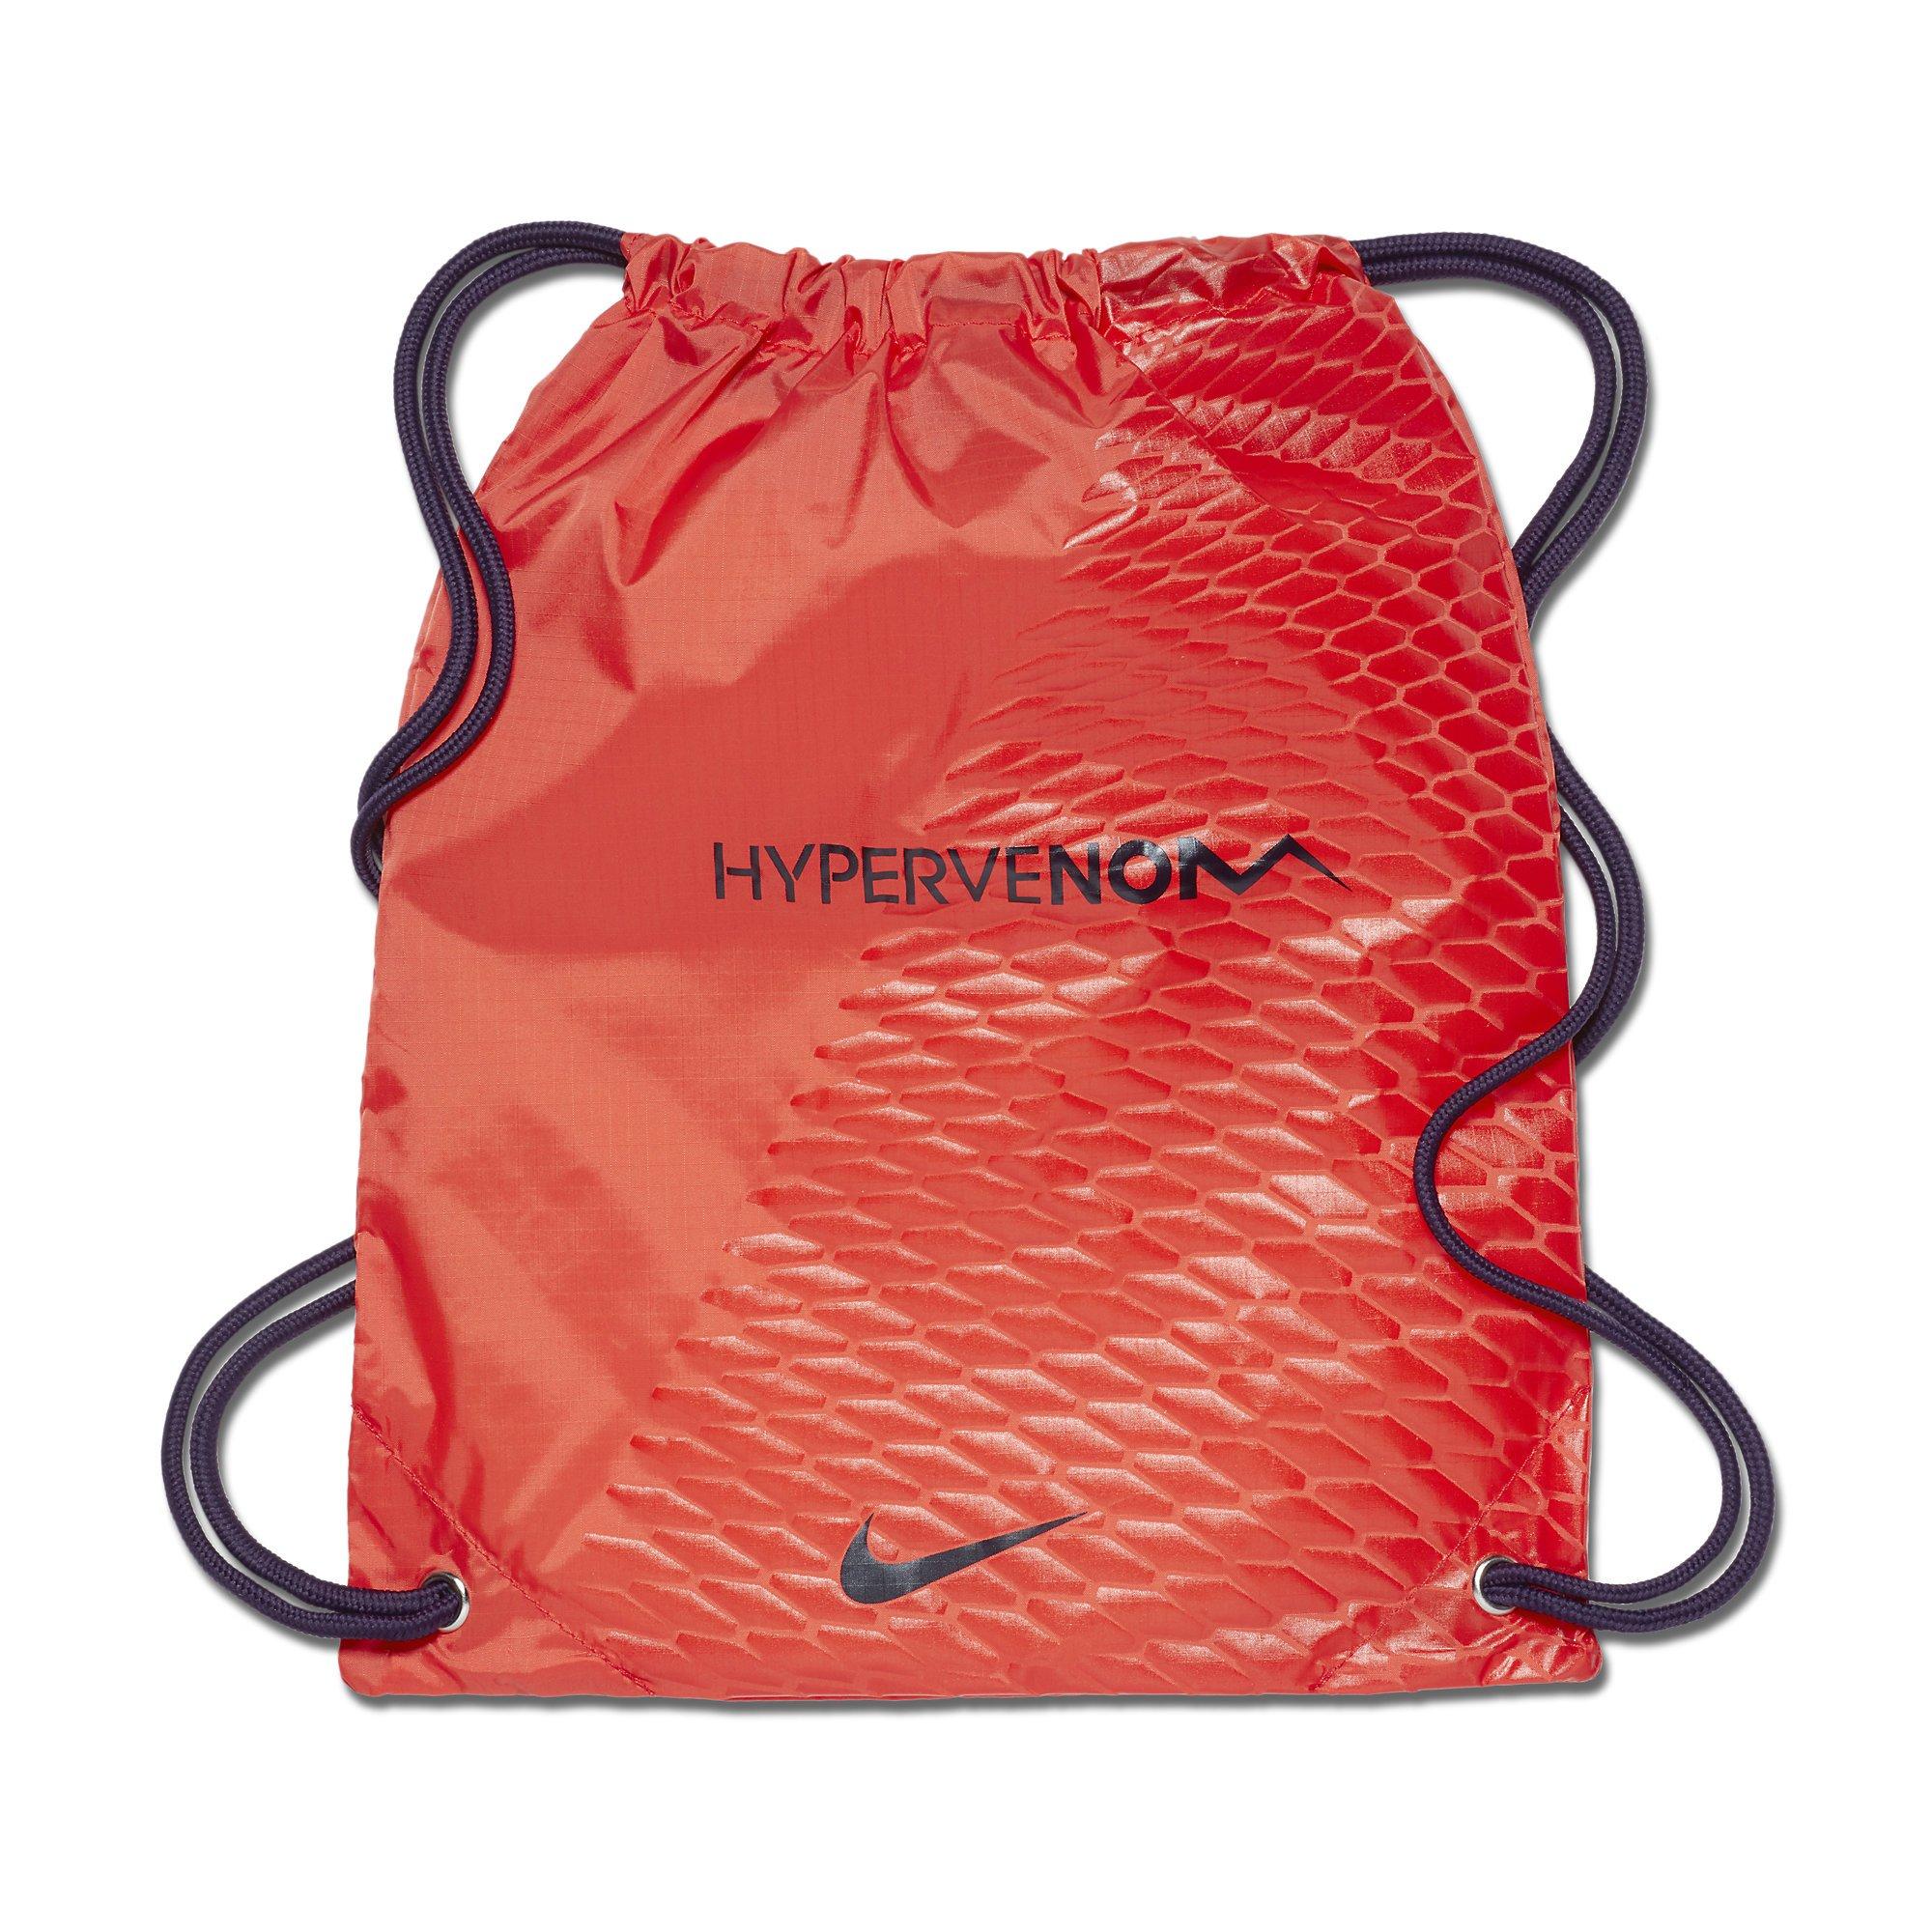 Nike Womens Hypervenom Phantom III Dynamic Fit FG Cleats [Wolf Grey] (8.5) by NIKE (Image #8)